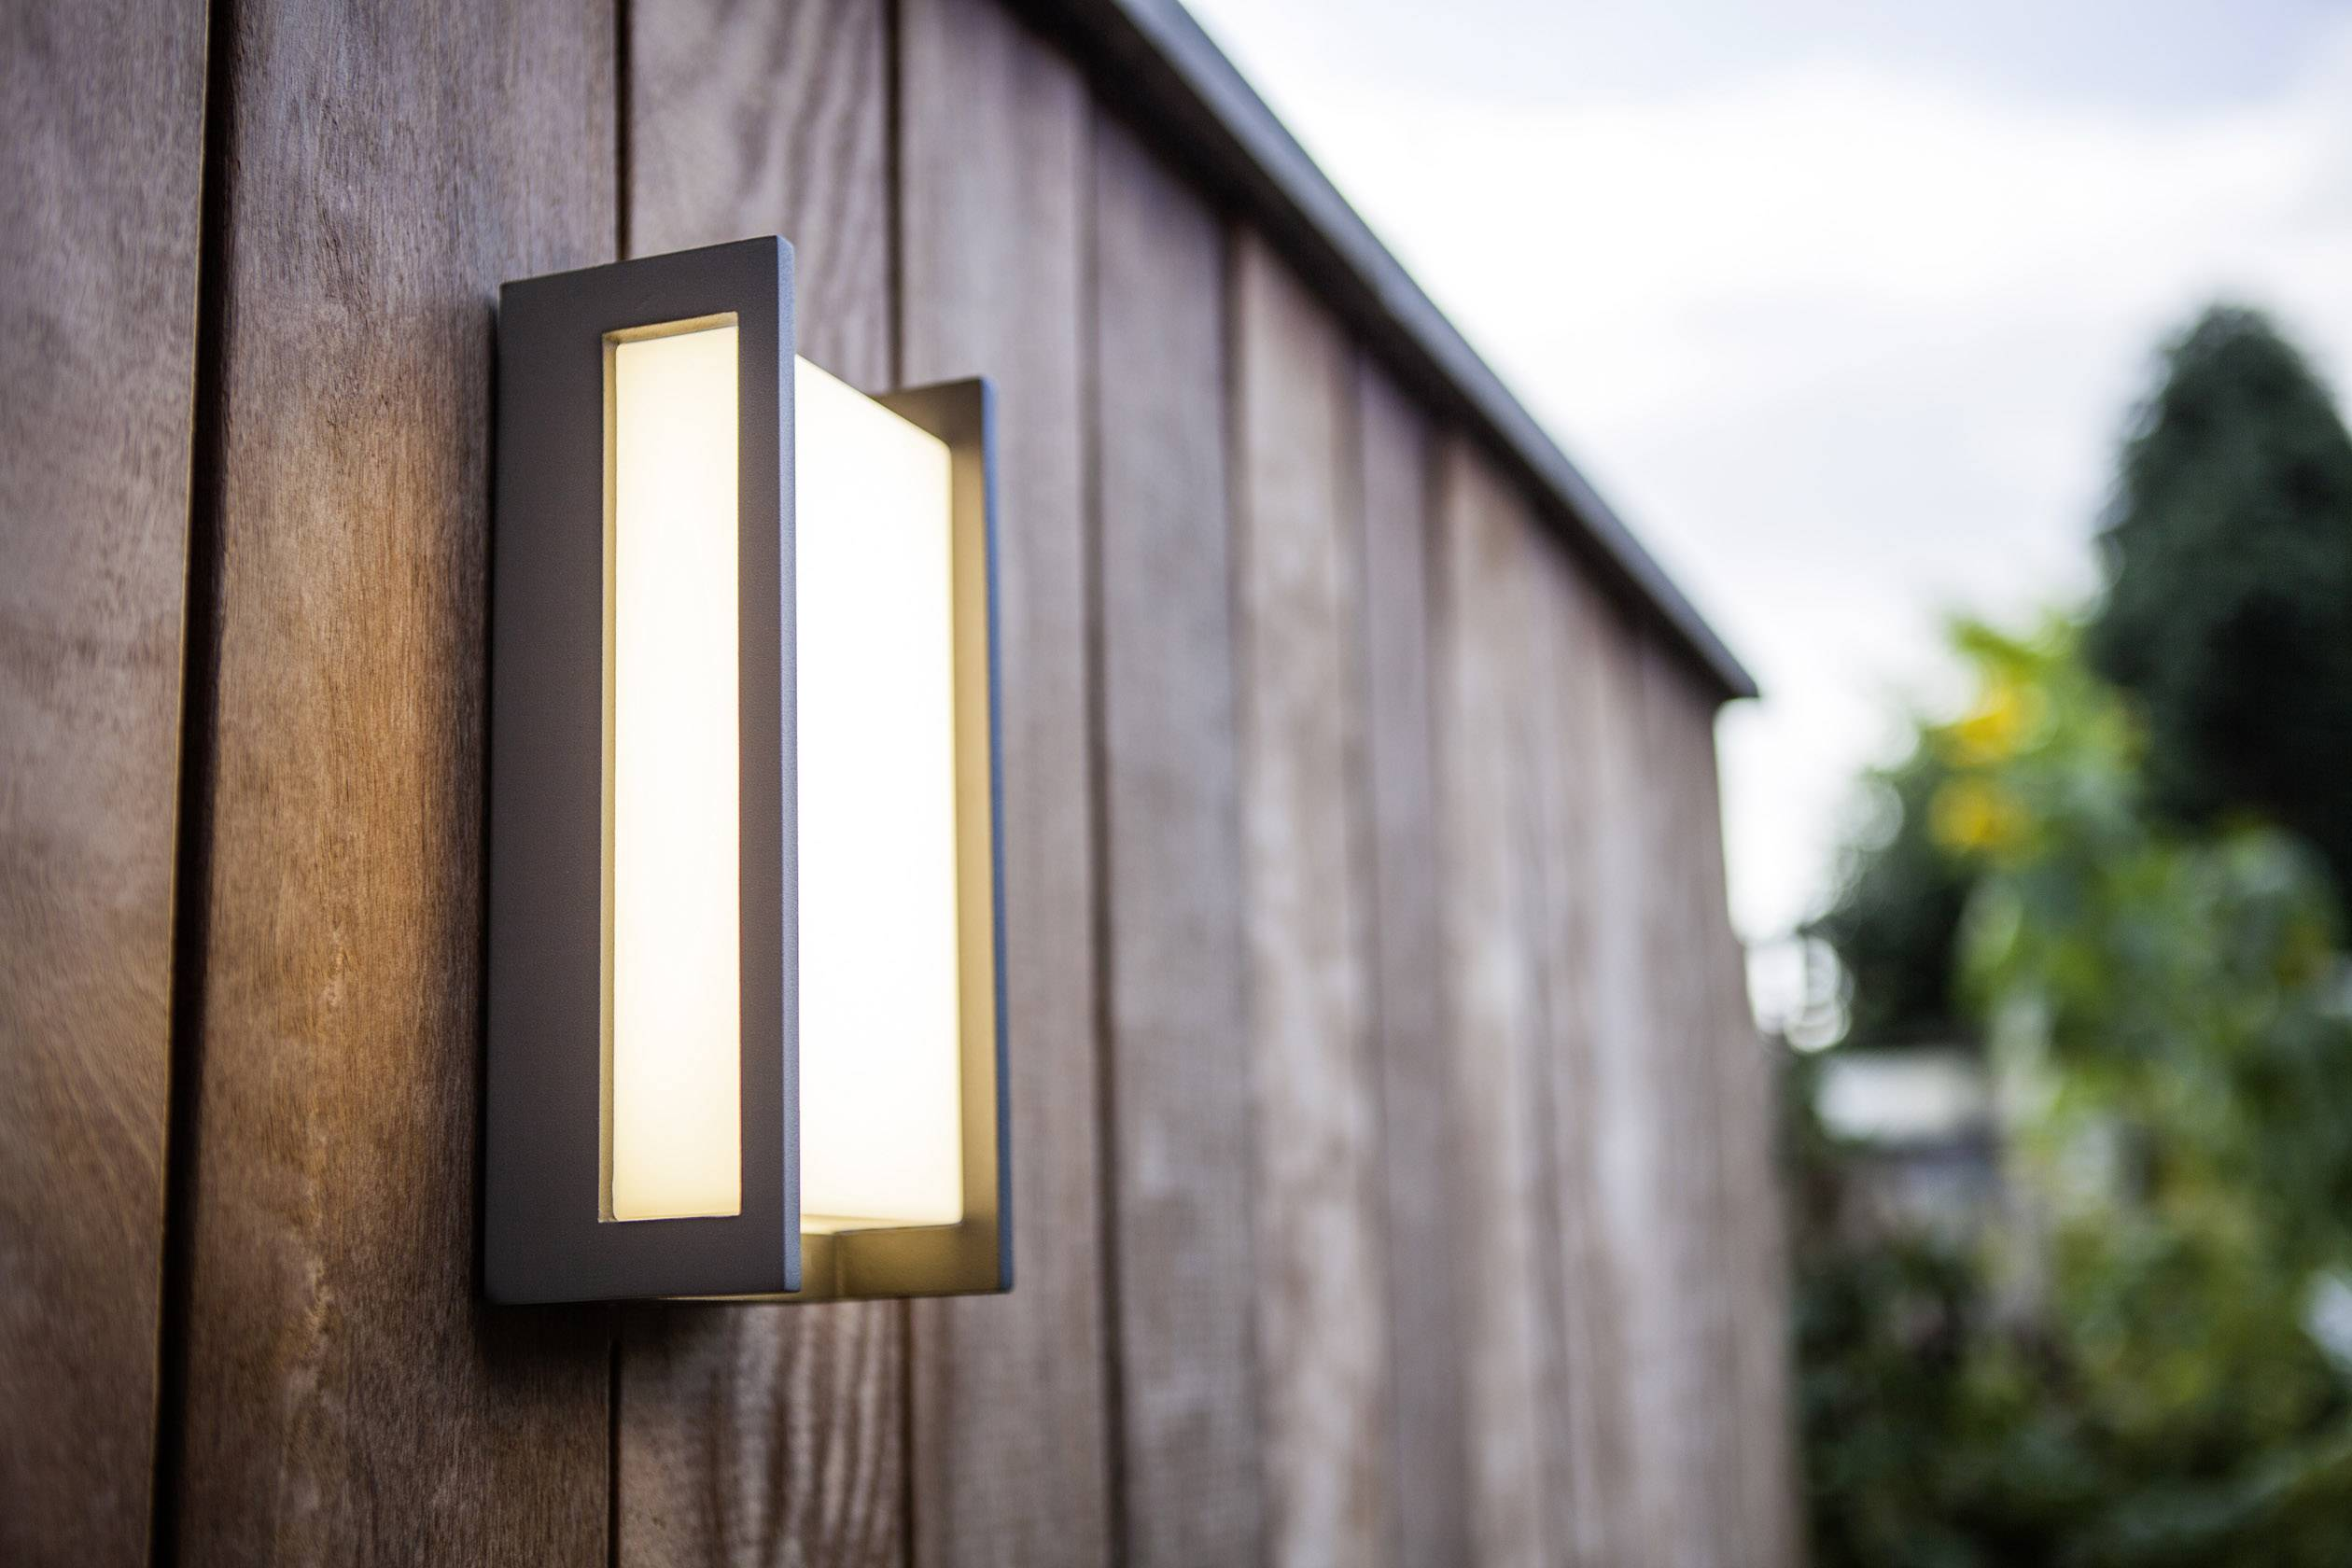 Lampada da parete esterno in ferro battuto campana rame cm ebay